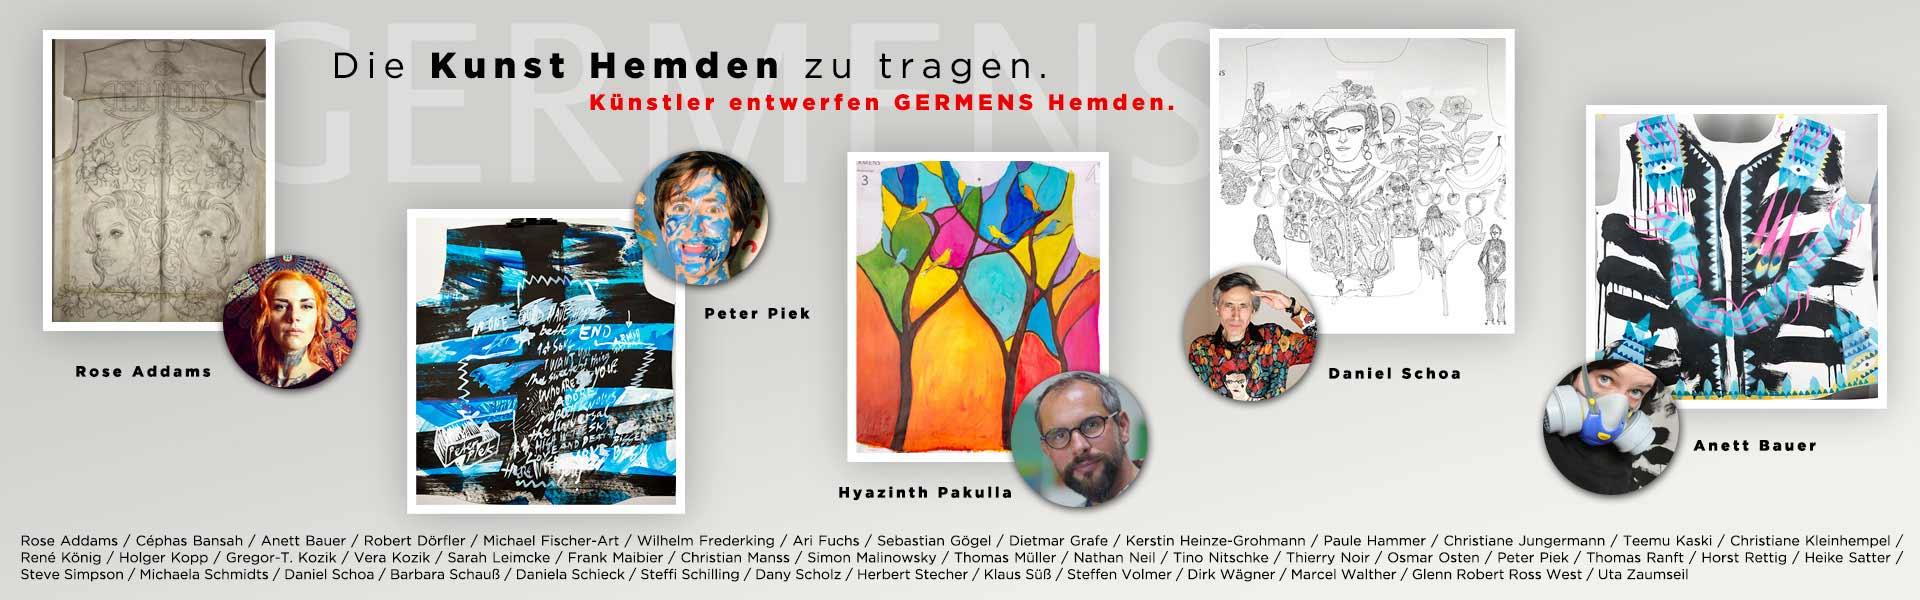 Künstler entwerfen GERMENS Hemden